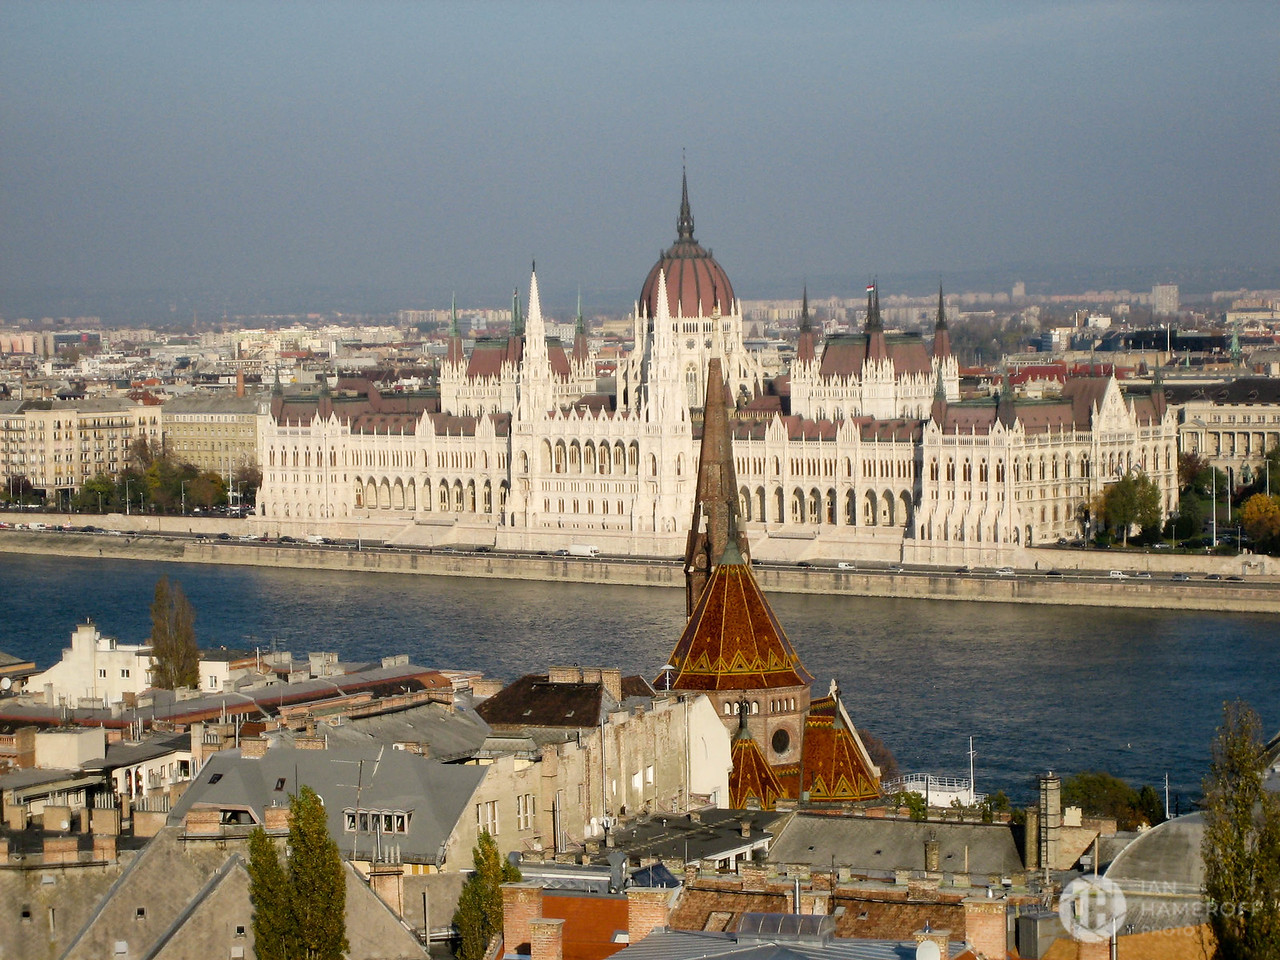 Országház and the Danube River